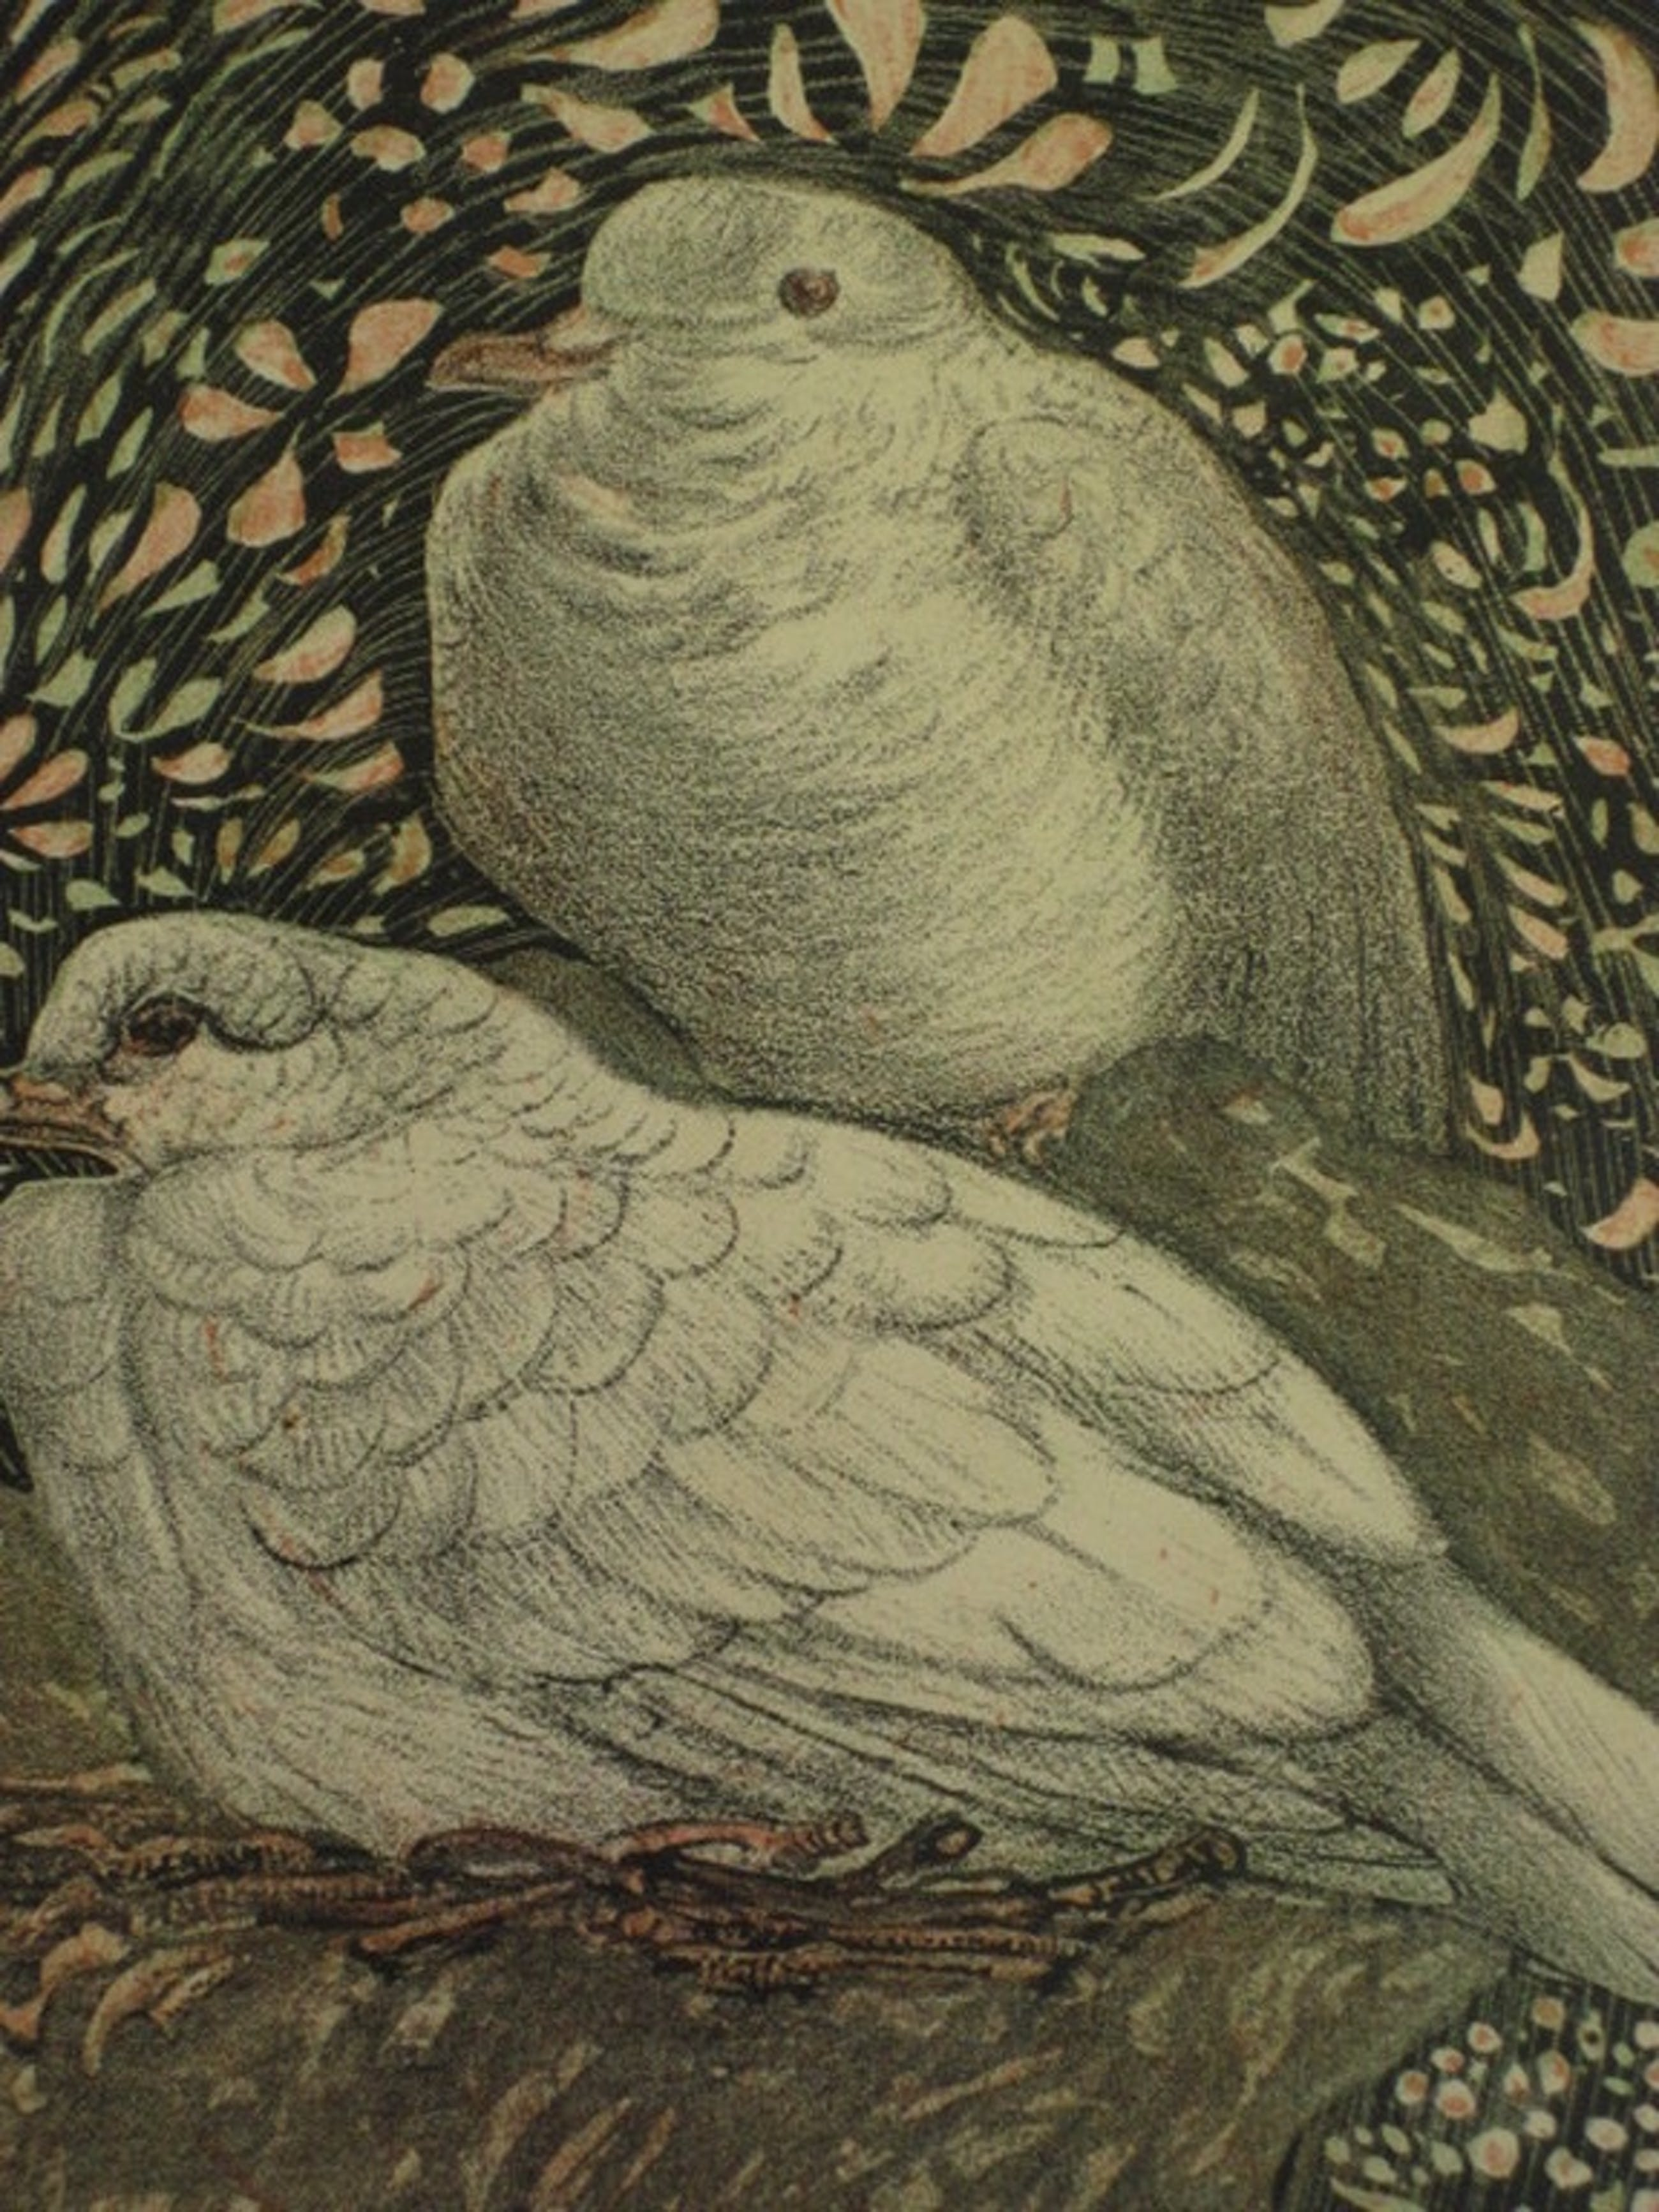 Theo van Hoytema 1863-1917 originele litho 1906 (kalender Going to the Zoo)  kopen? Bied vanaf 1!